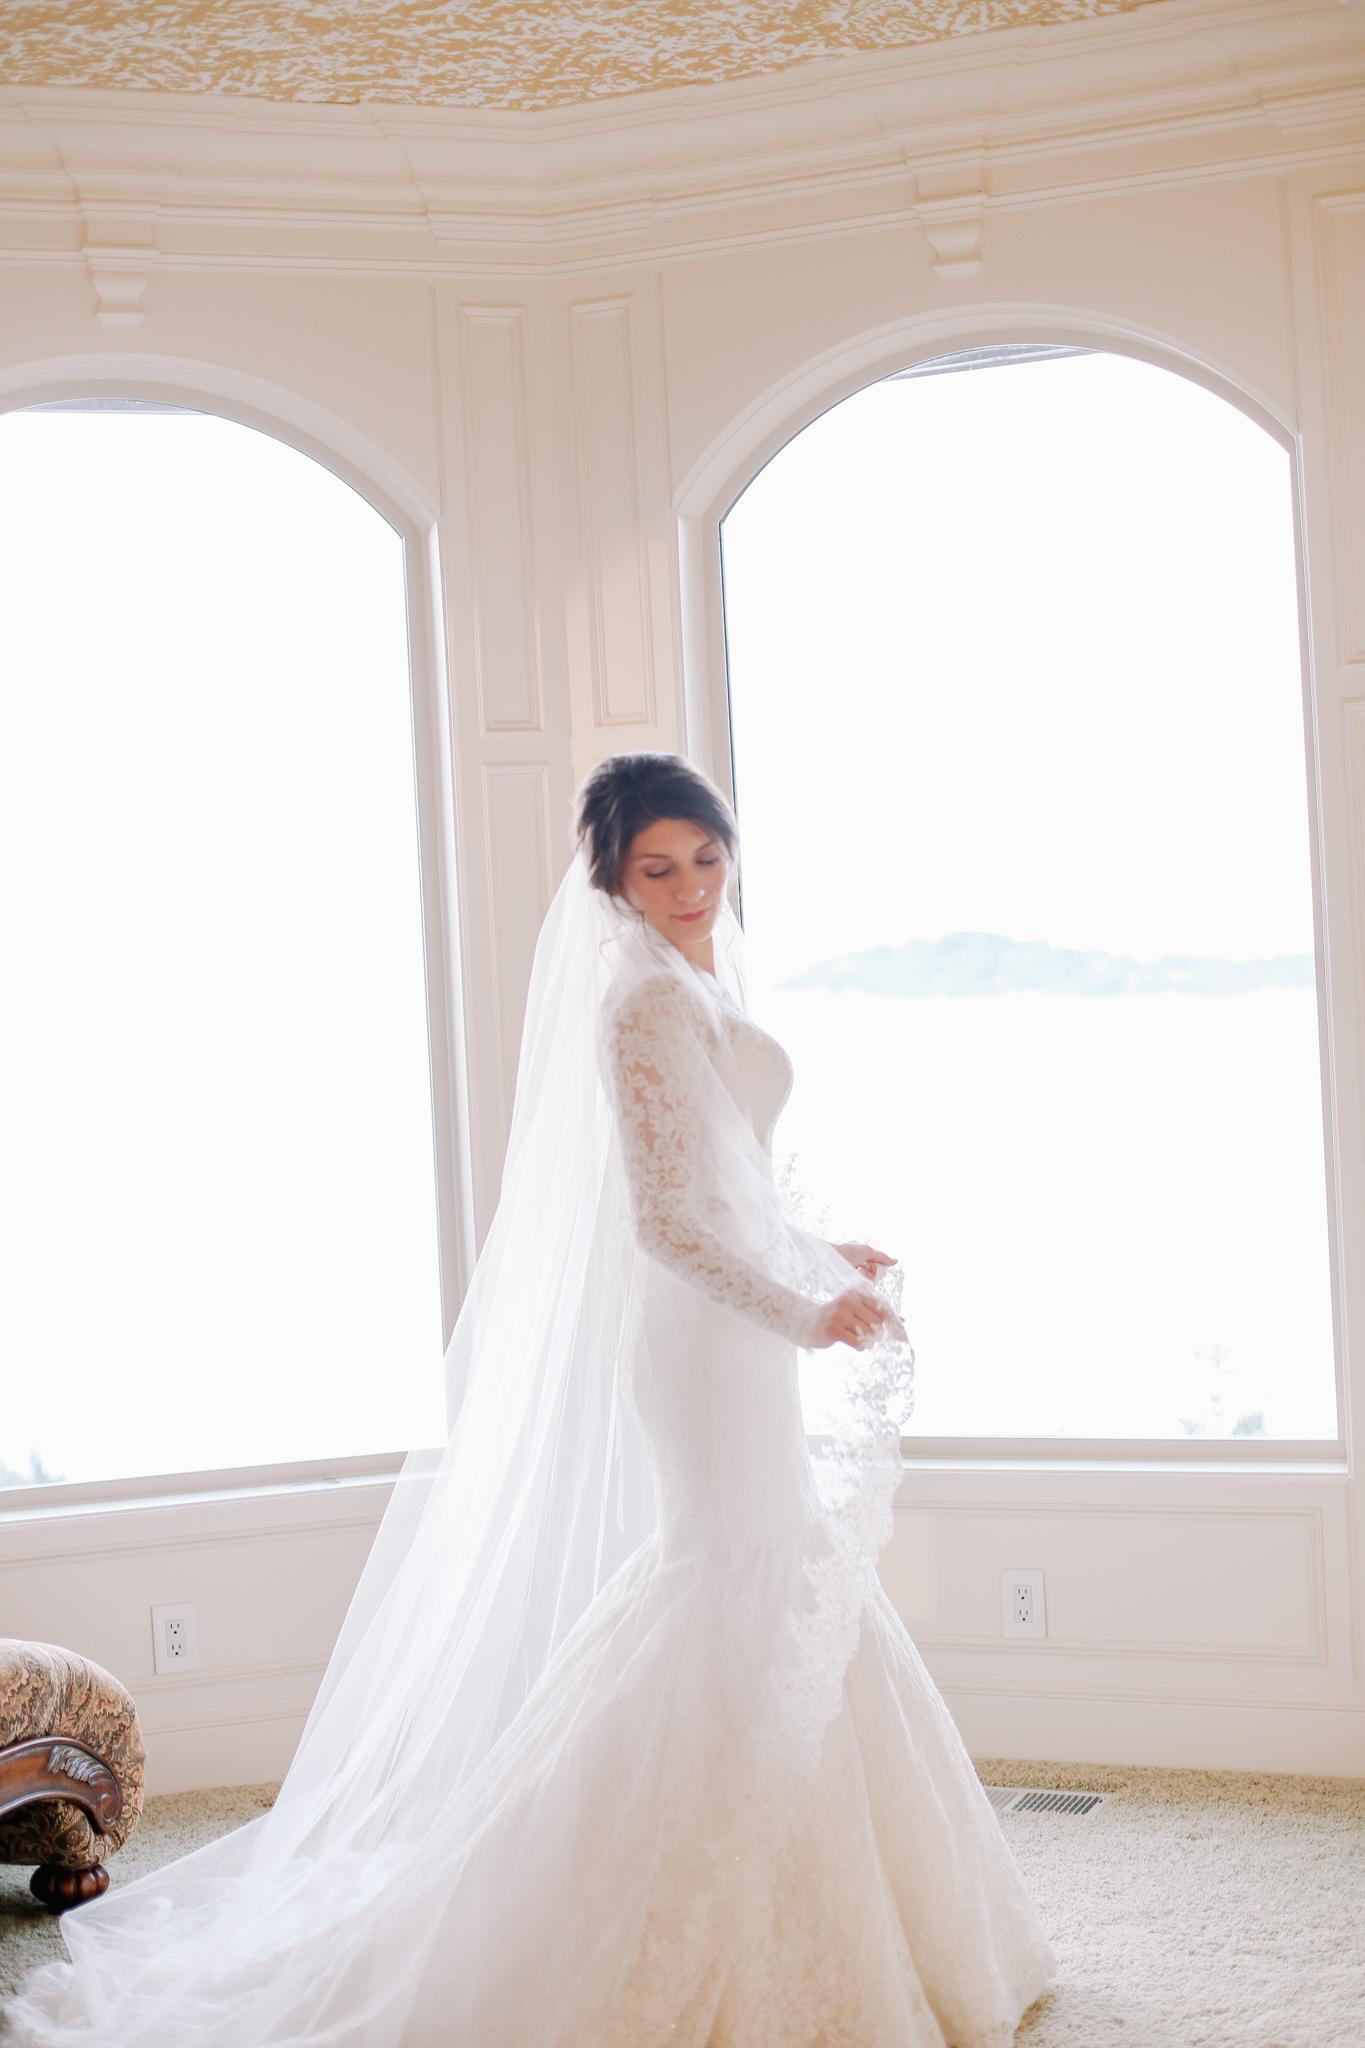 Manu and Laura - Portland Wedding Photographer - 15.jpg